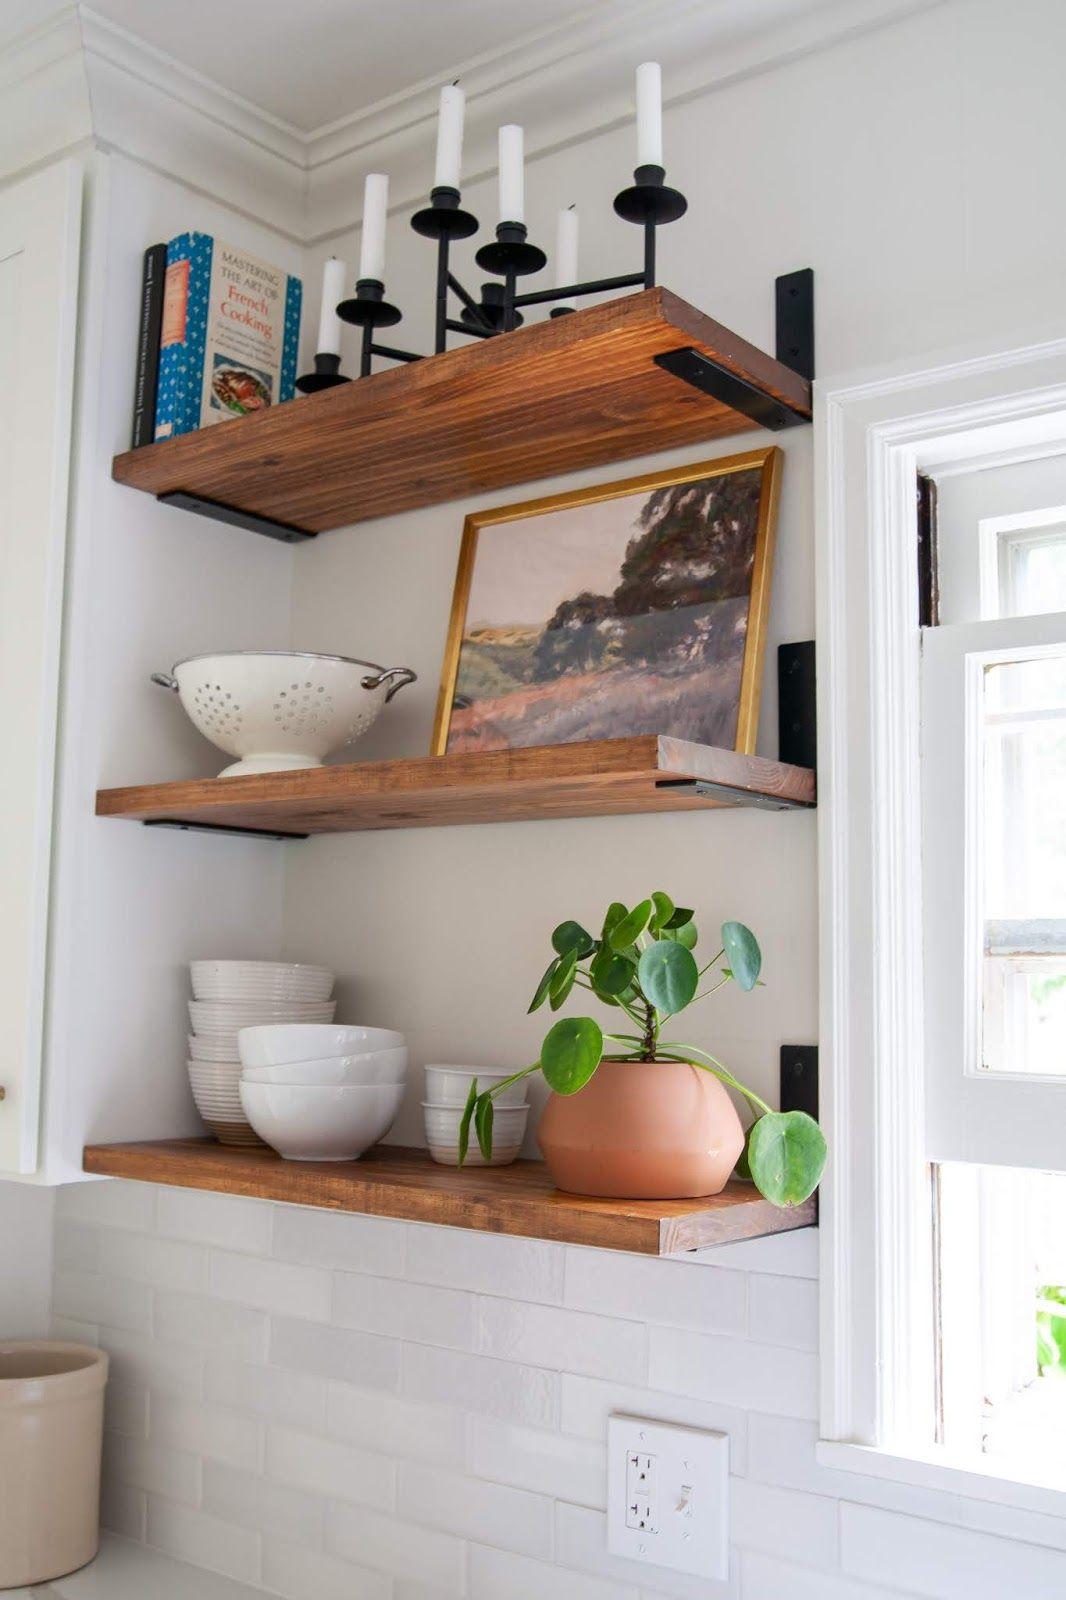 Diy Budget Friendly Floating Look Open Shelves Diy Wood Shelves Floating Shelves Diy Floating Shelves Kitchen